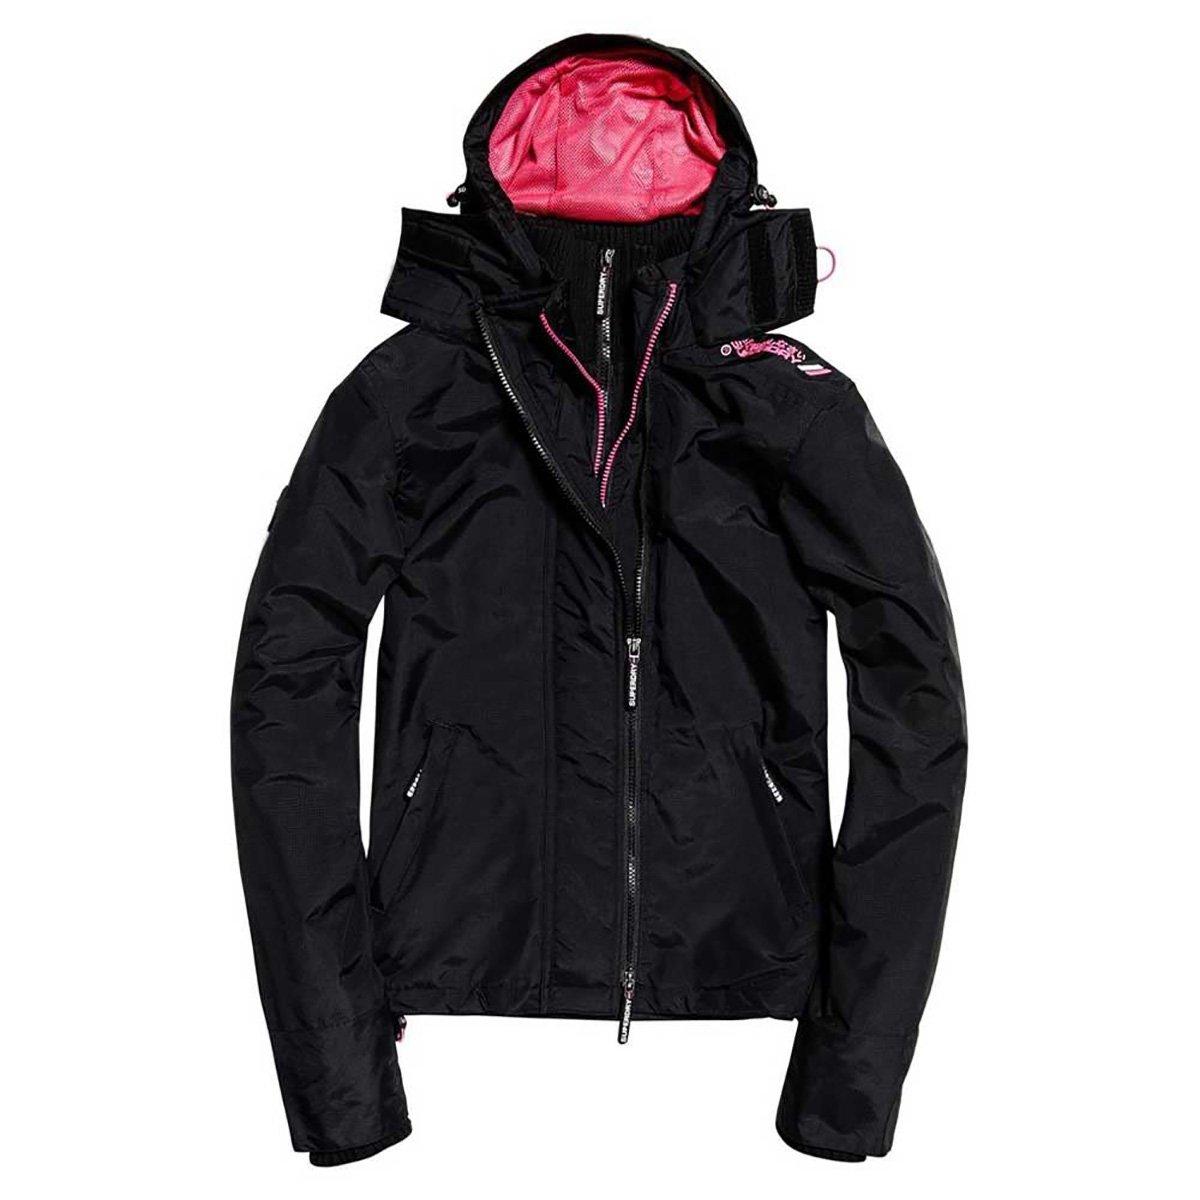 Superdry Women's Tech Hood Pop Zip Windcheater Jacket